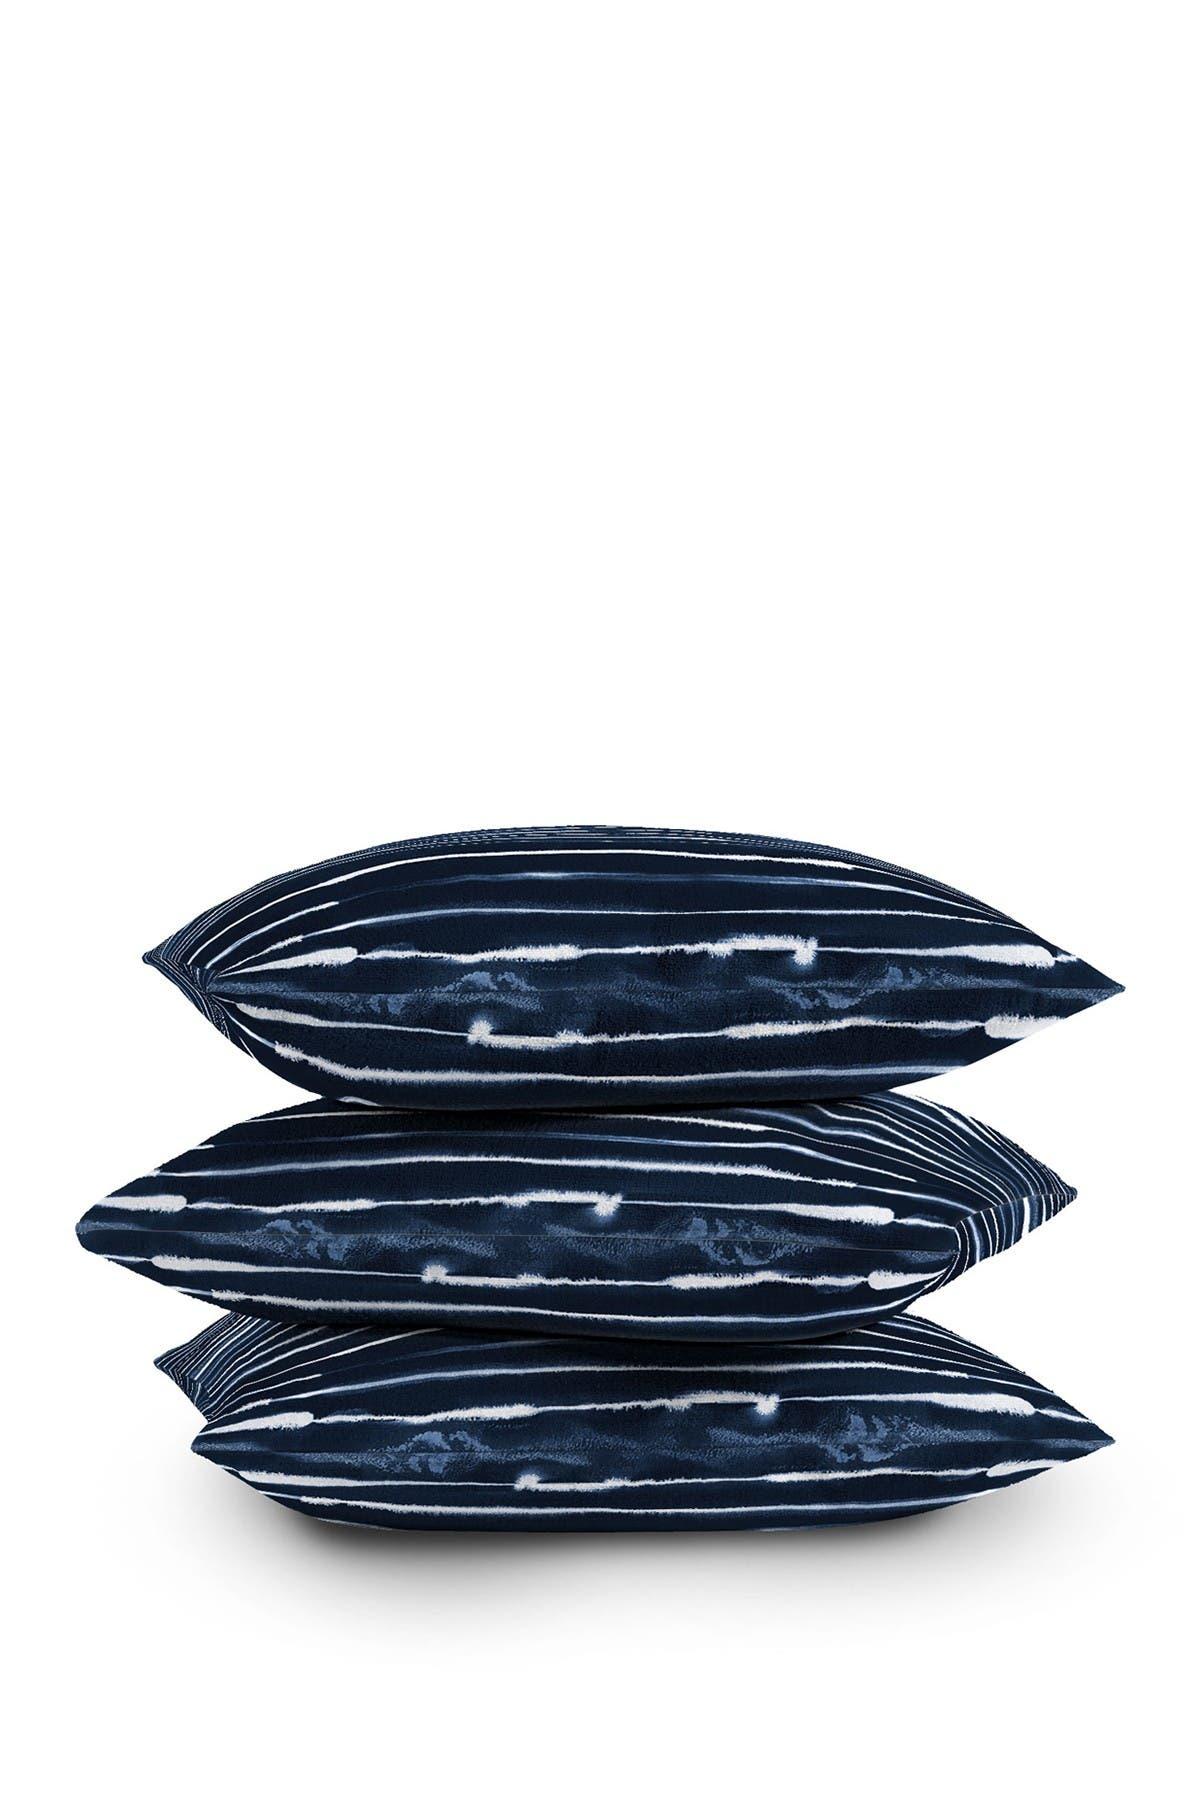 Image of Deny Designs Ninola Design Navy Ink Stripes Square Throw Pillow